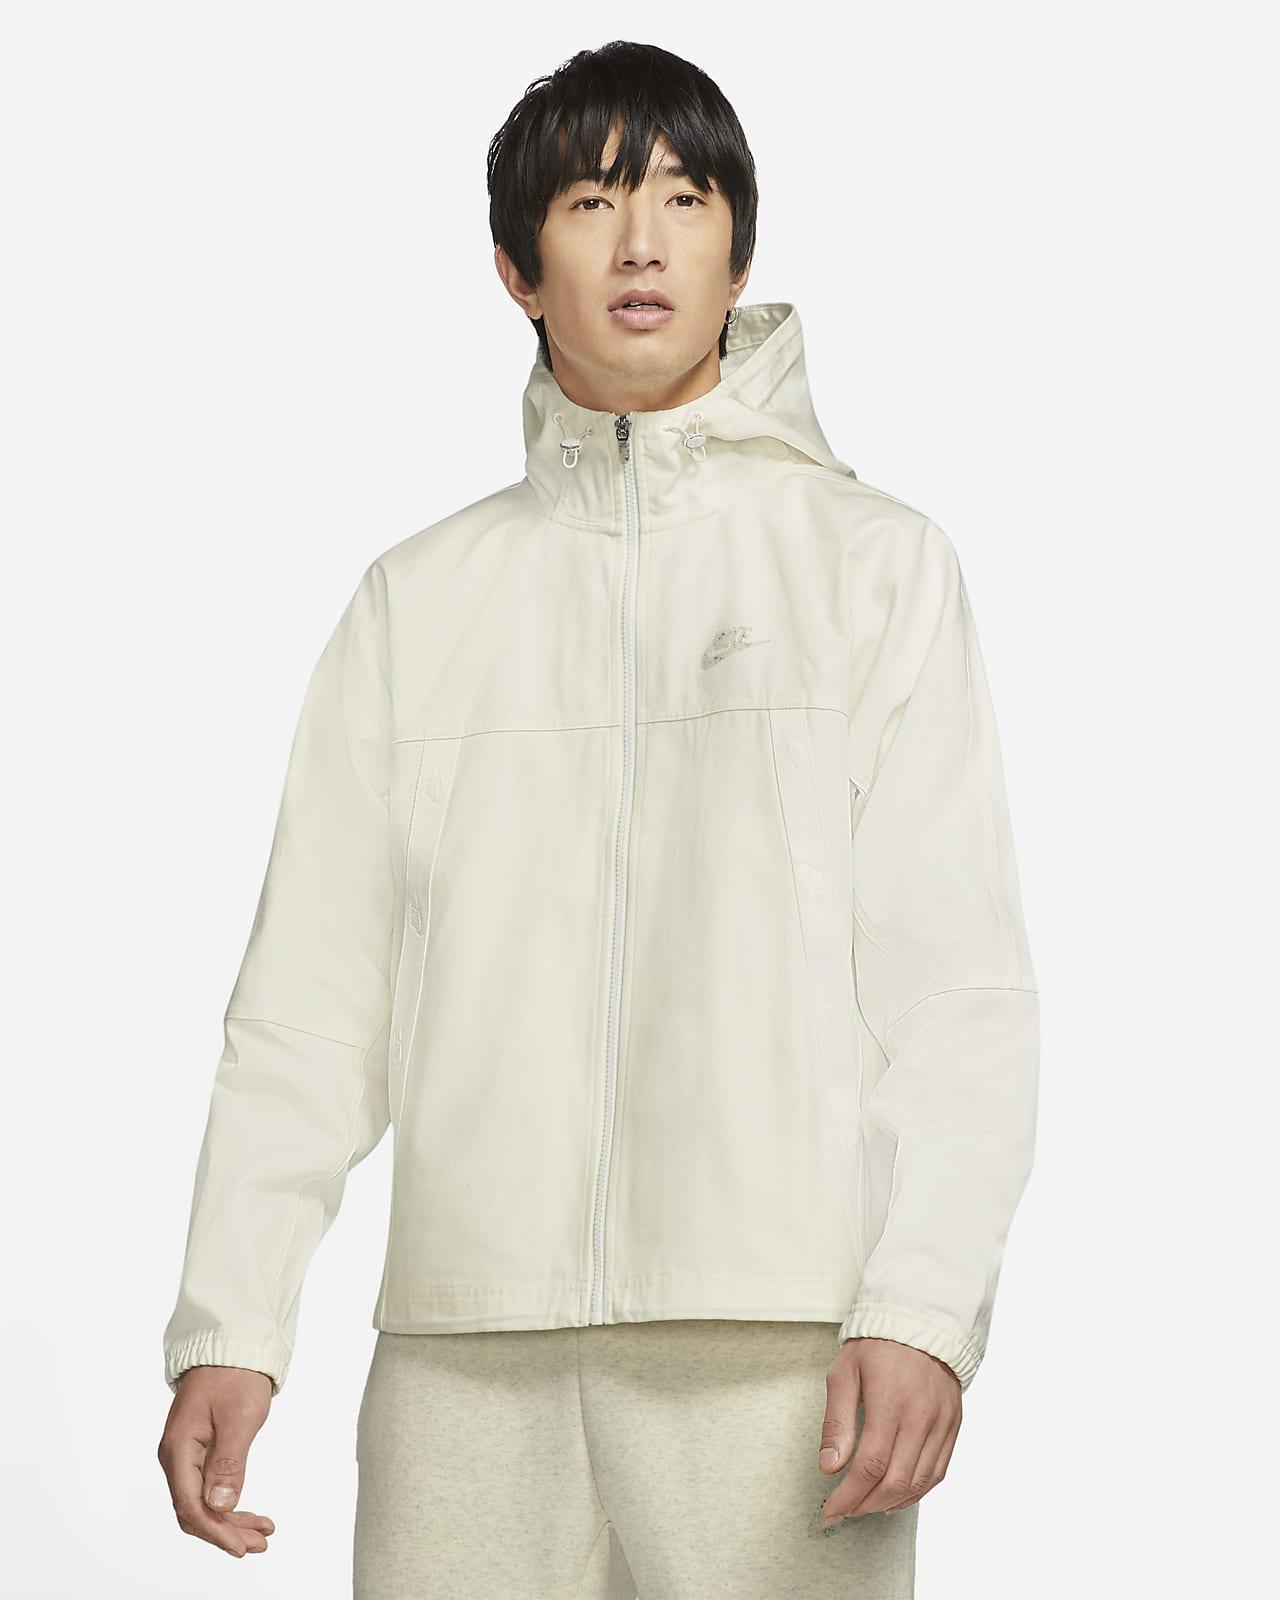 Nike Sportswear Canvas 男子夹克